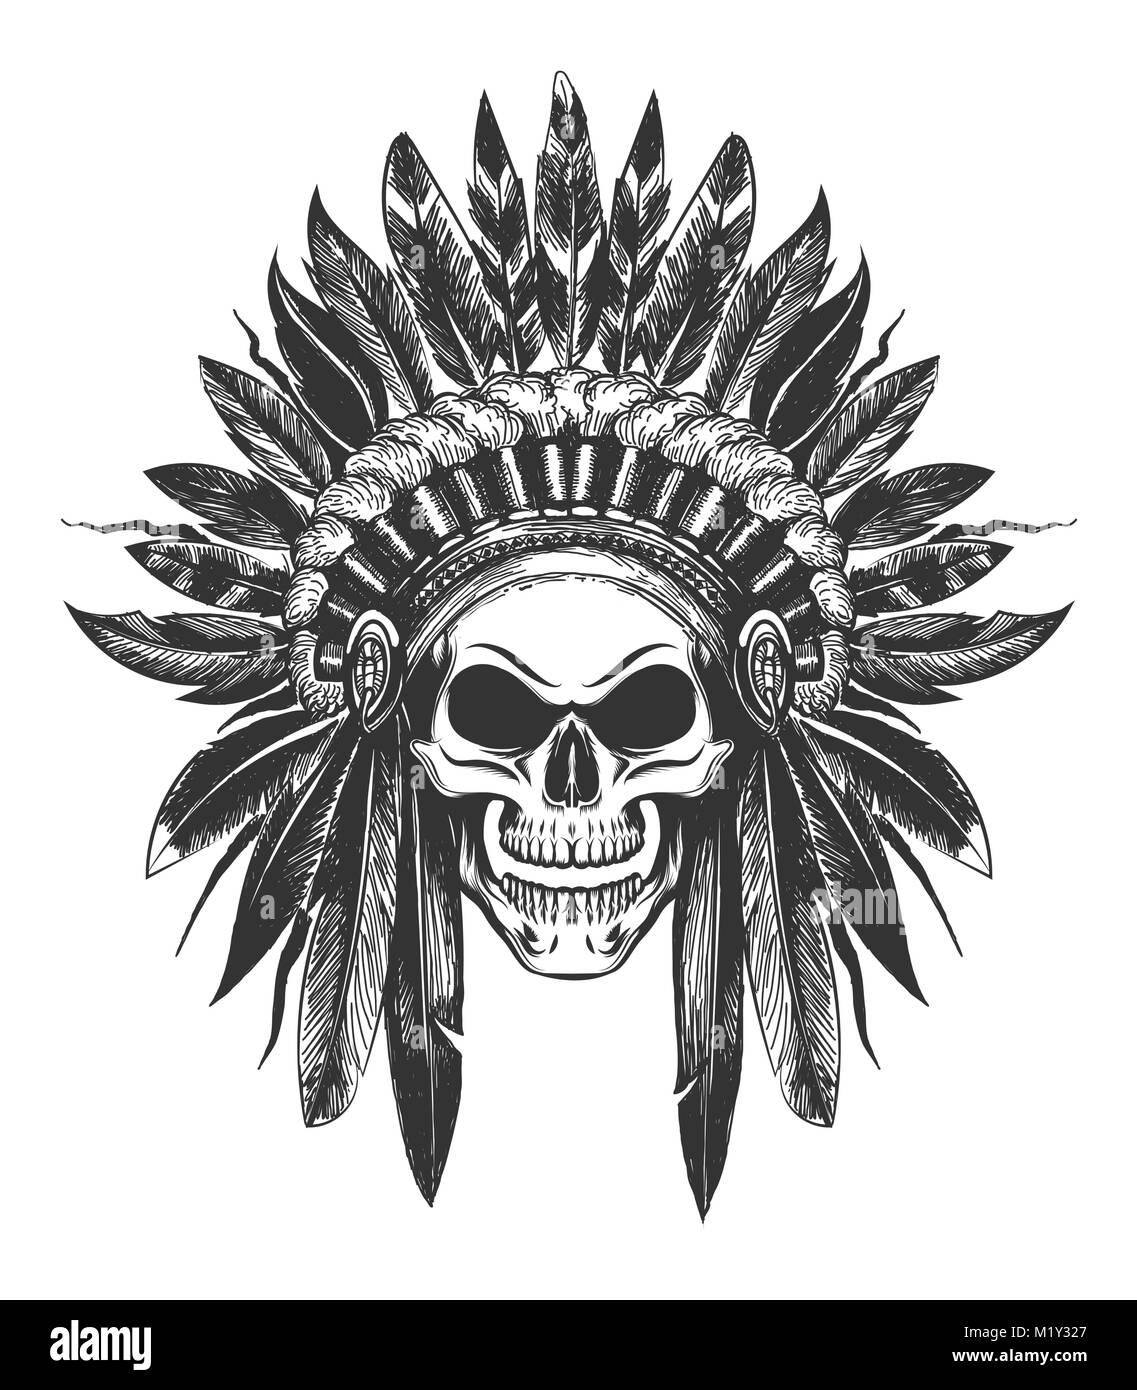 cr u00e2ne humain dans la r u00e9gion de native american indian war Indian Warrior Logo Indian Chief Motorcycle Logo